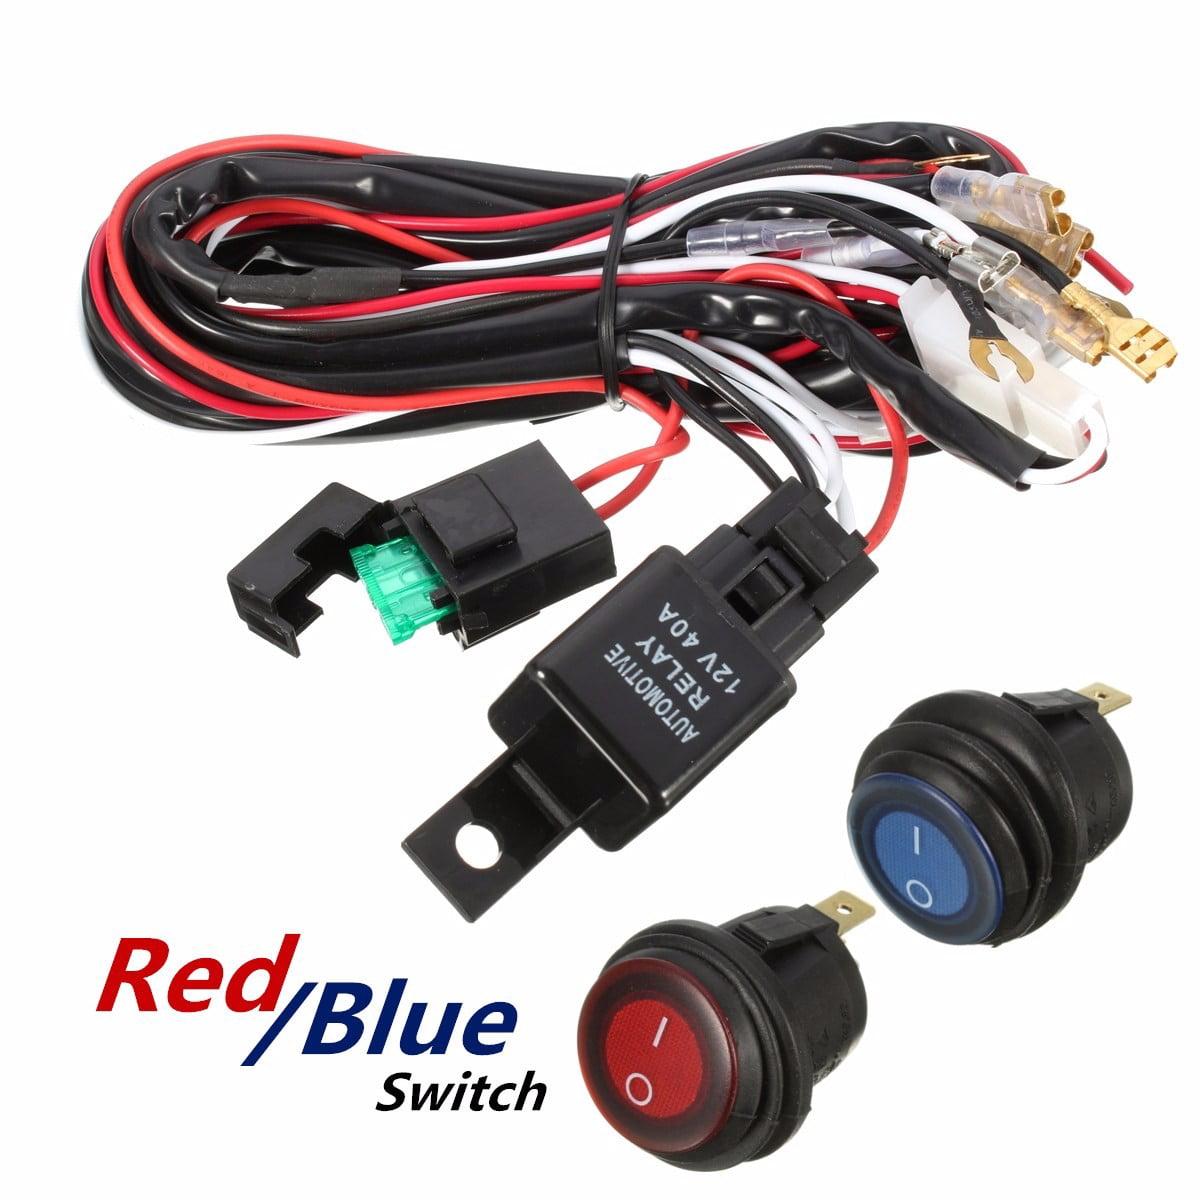 Wiring Harness Relay 40A 12V LED Light Bar Blue Switch FIT Off Road ATV  US,Red color - Walmart.com - Walmart.comWalmart.com